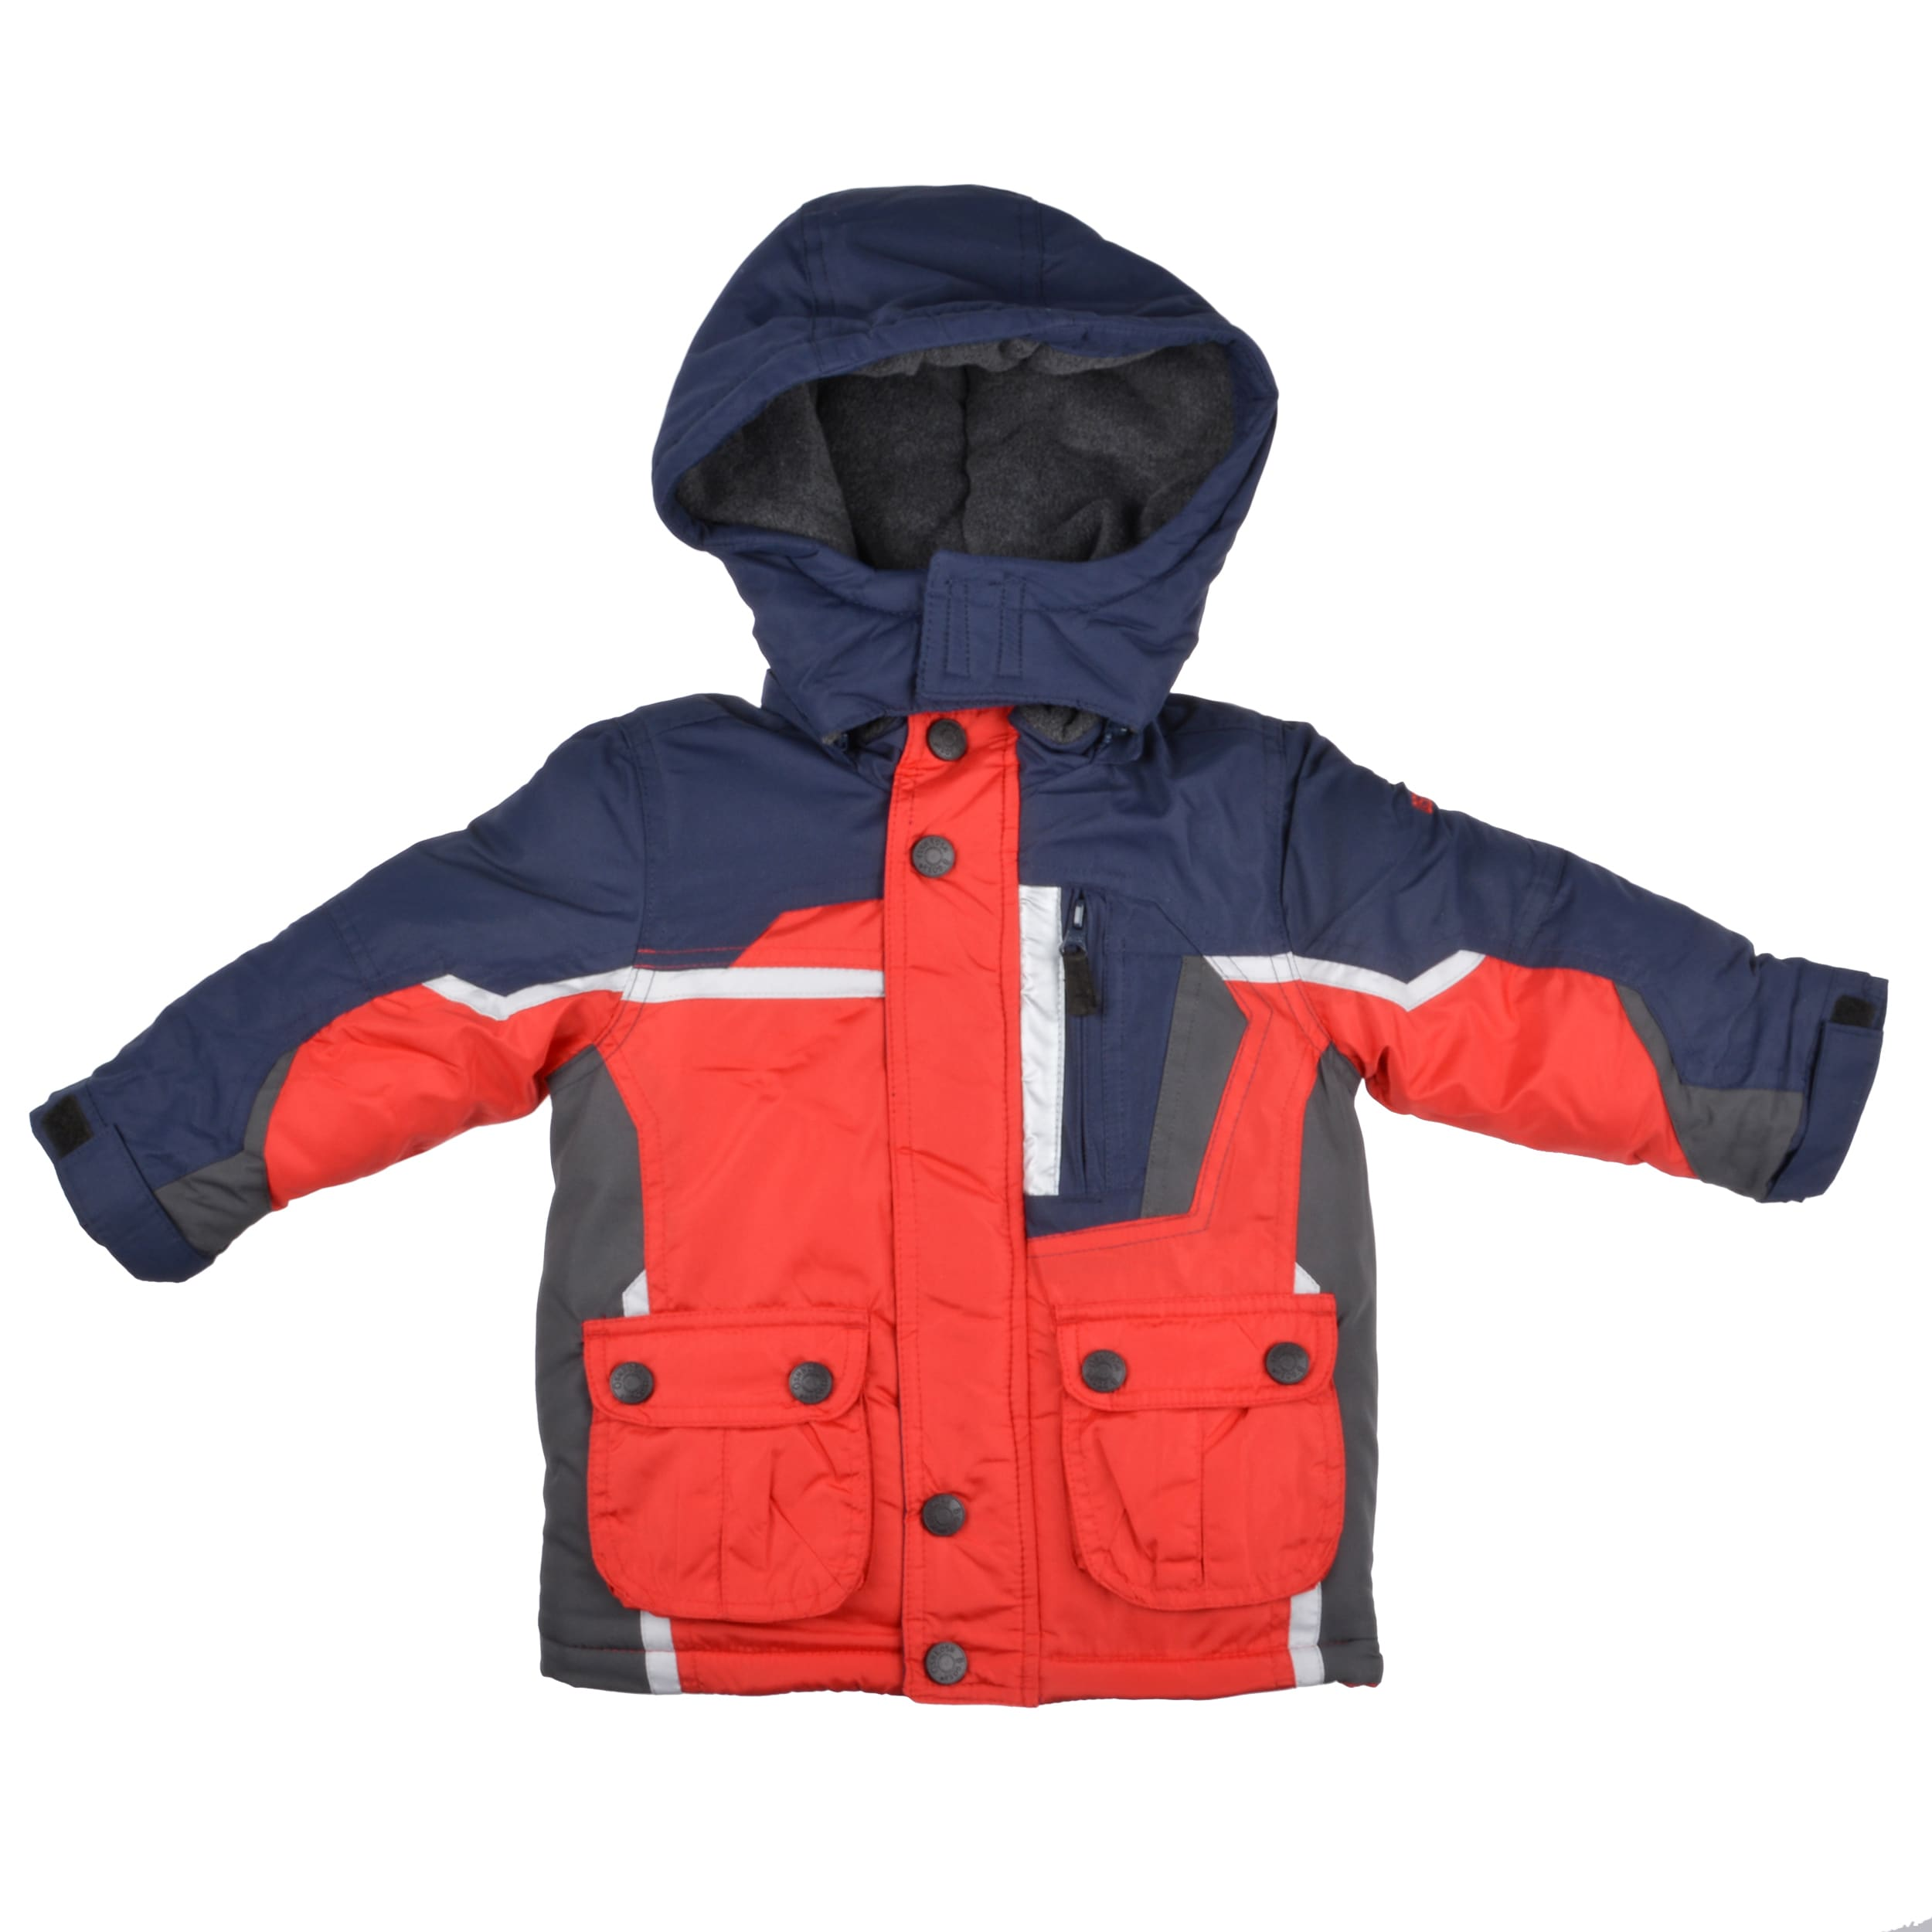 103ee2b0c1a3 Osh Kosh Boys Fleece Lined Hooded Jacket on PopScreen